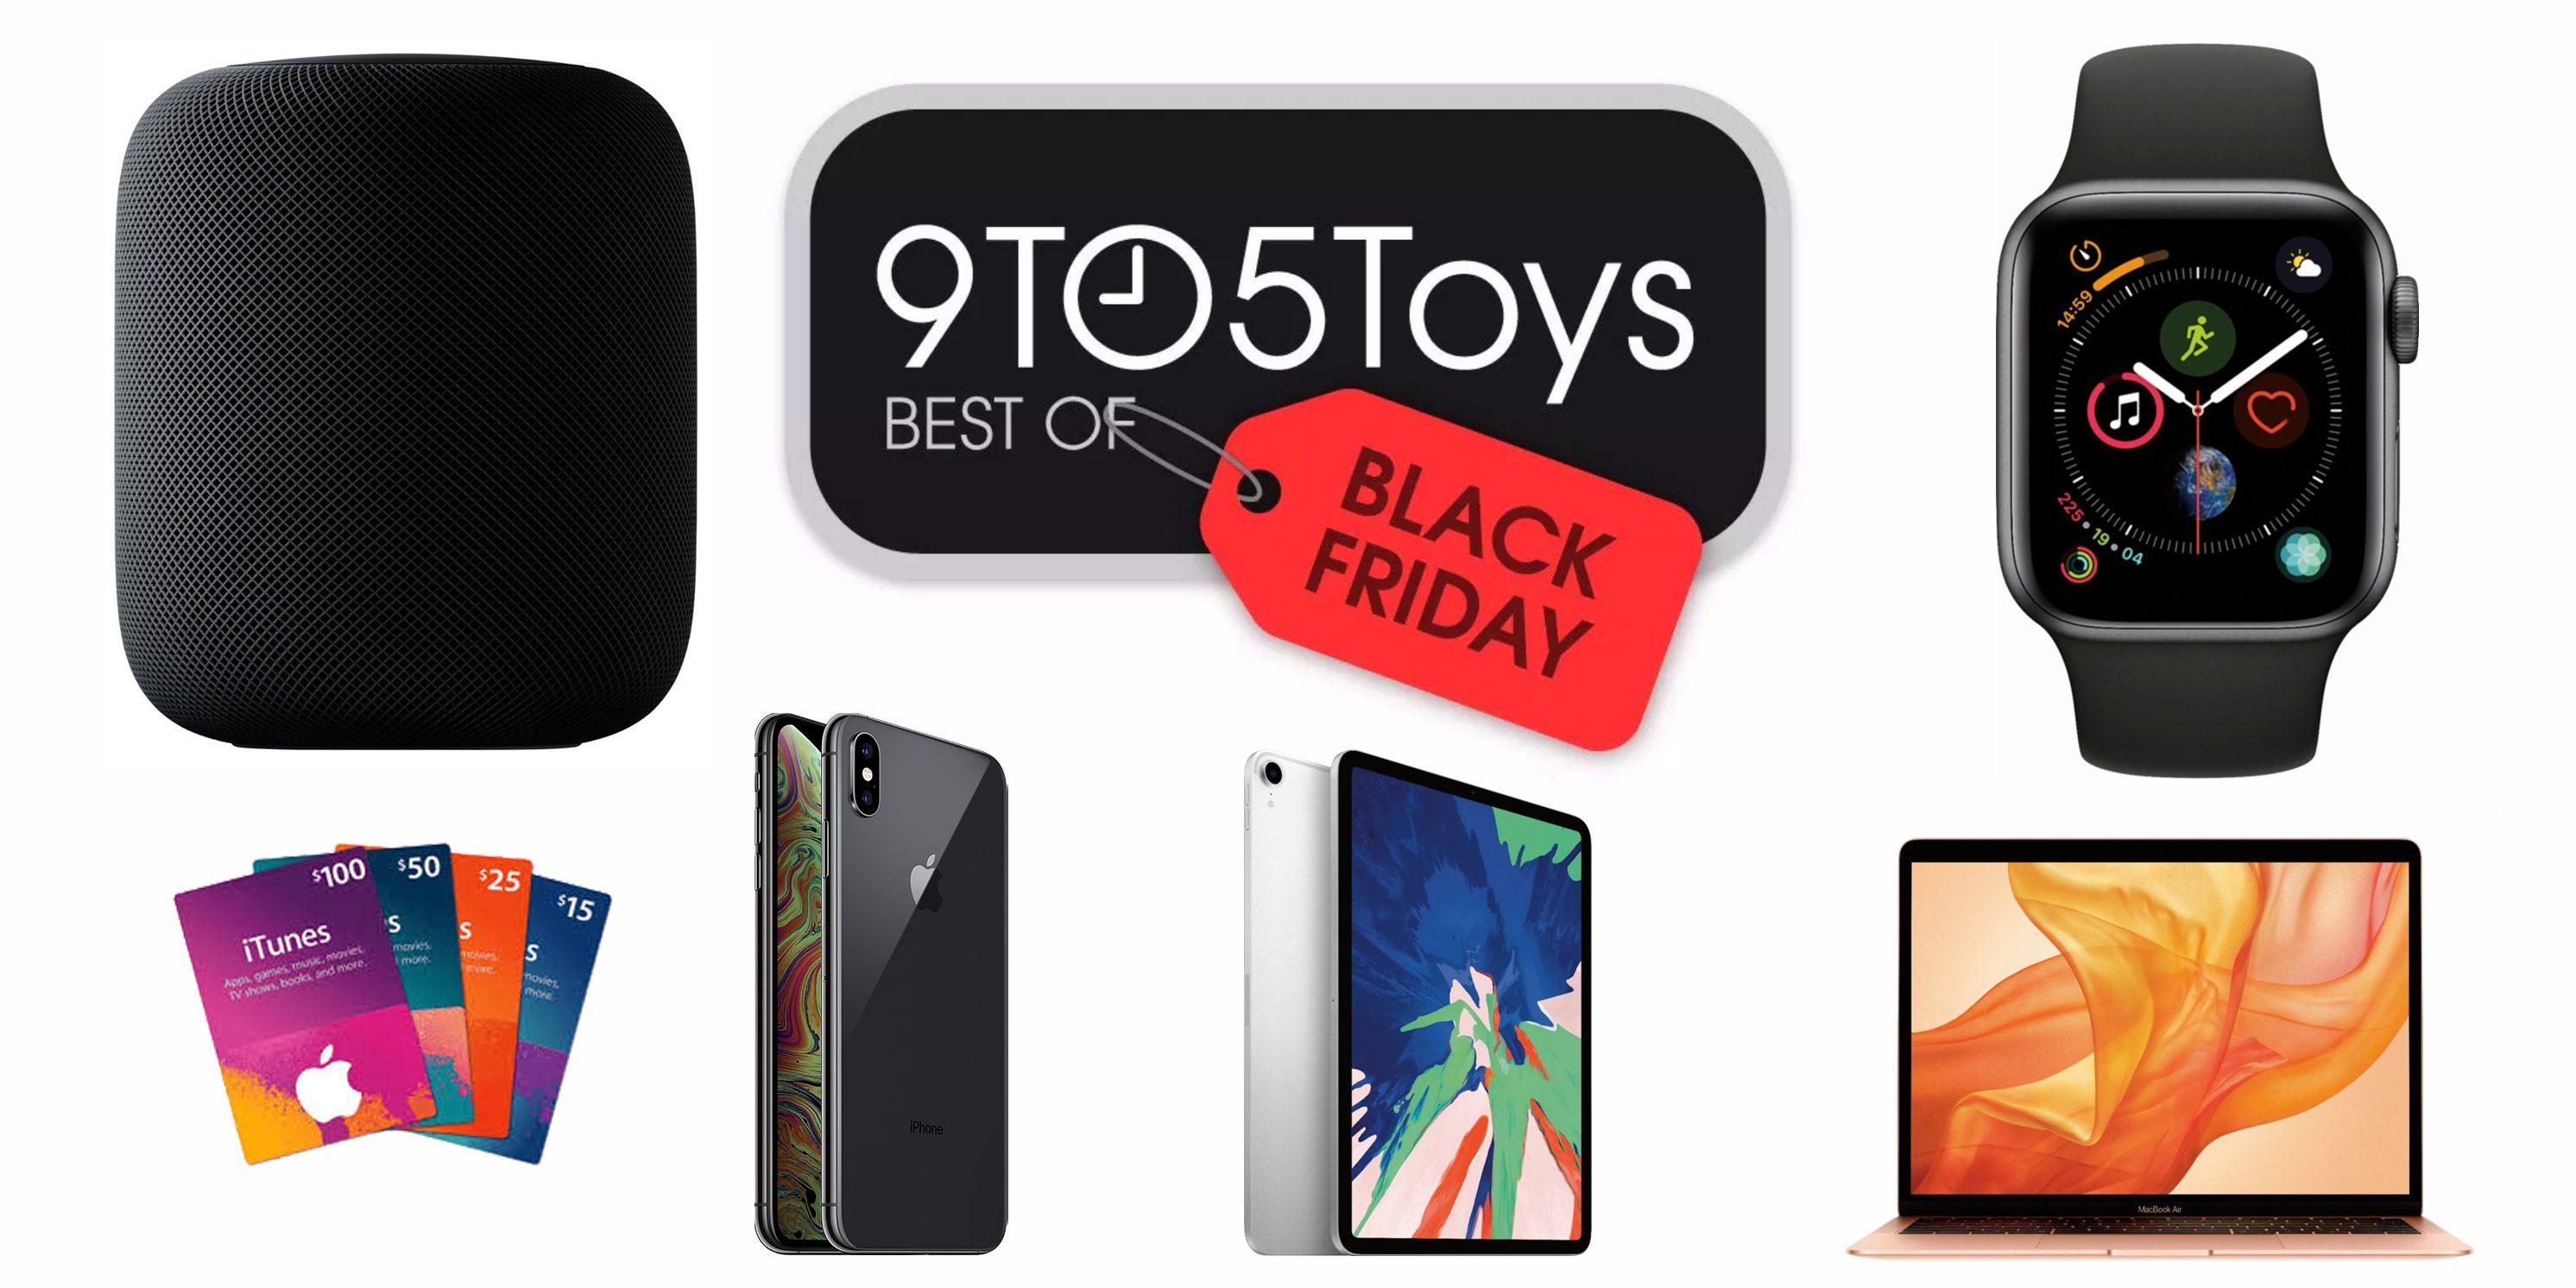 Best of Black Friday 2018 – Apple: HomePod $250, $400 gift card w/ iPhone, MacBooks, iPad, more